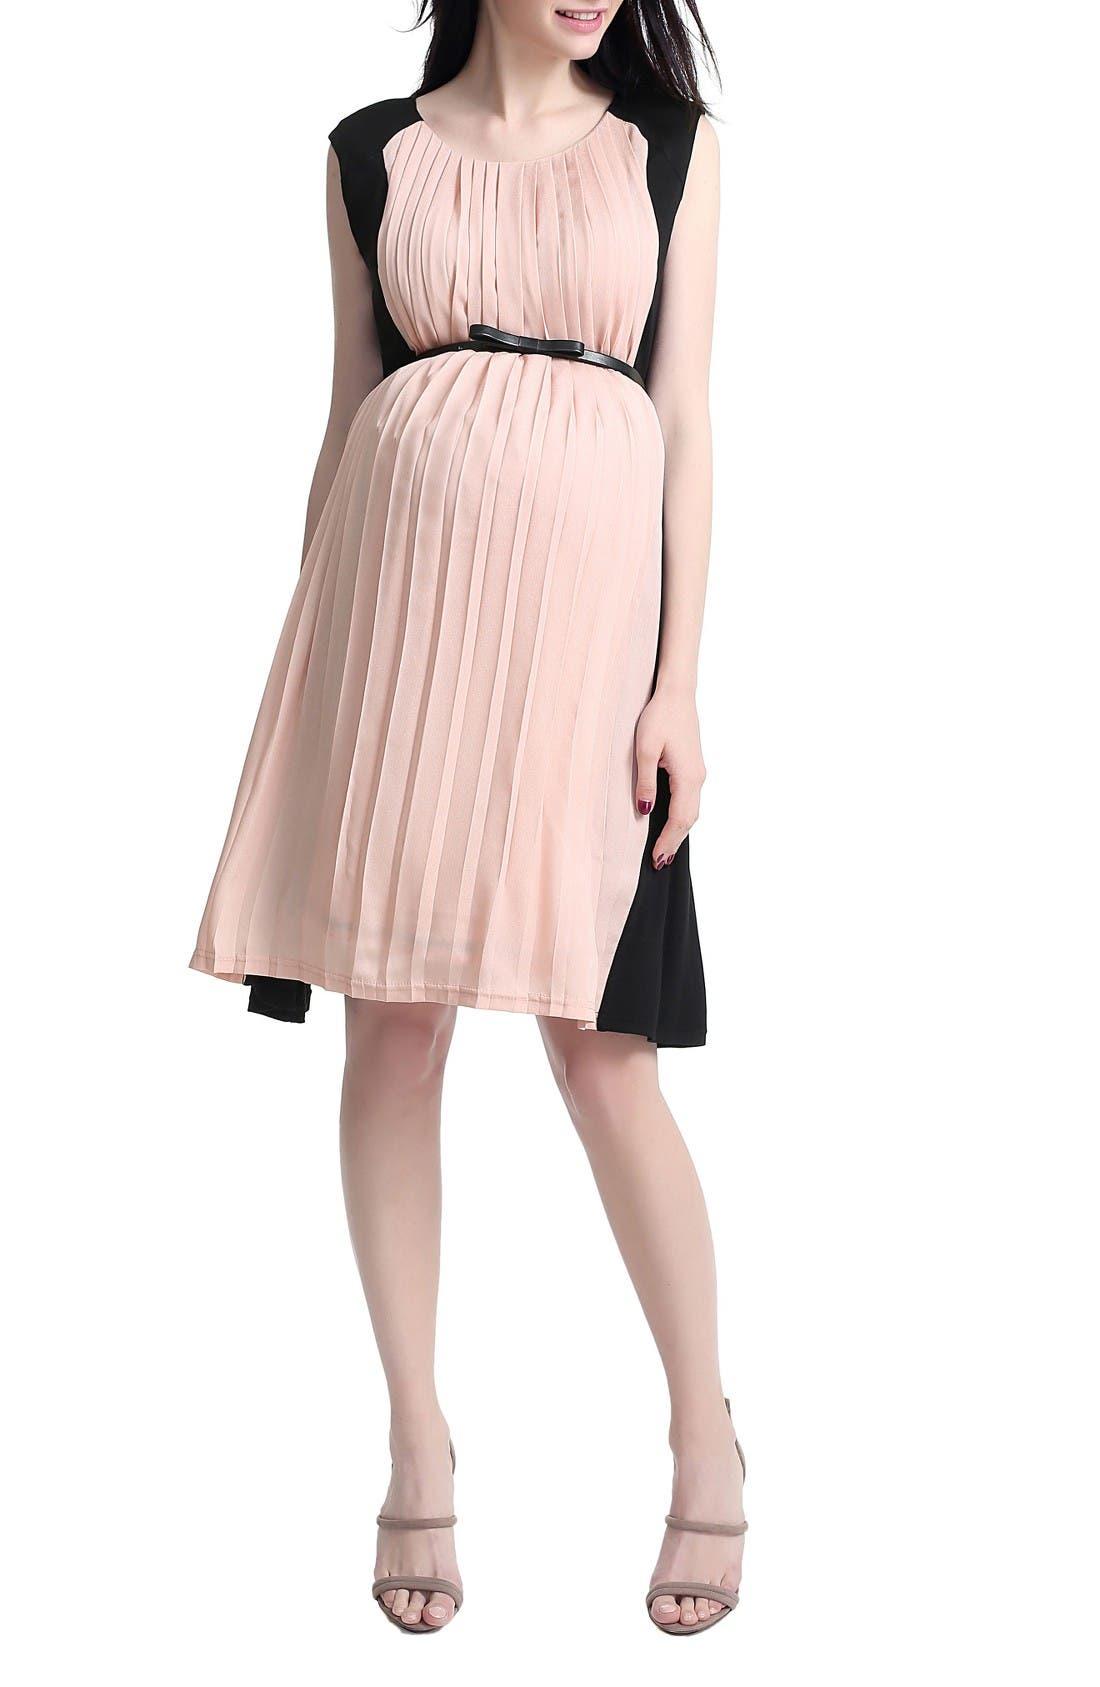 KIMI AND KAI Anita Pleated Maternity/Nursing Dress